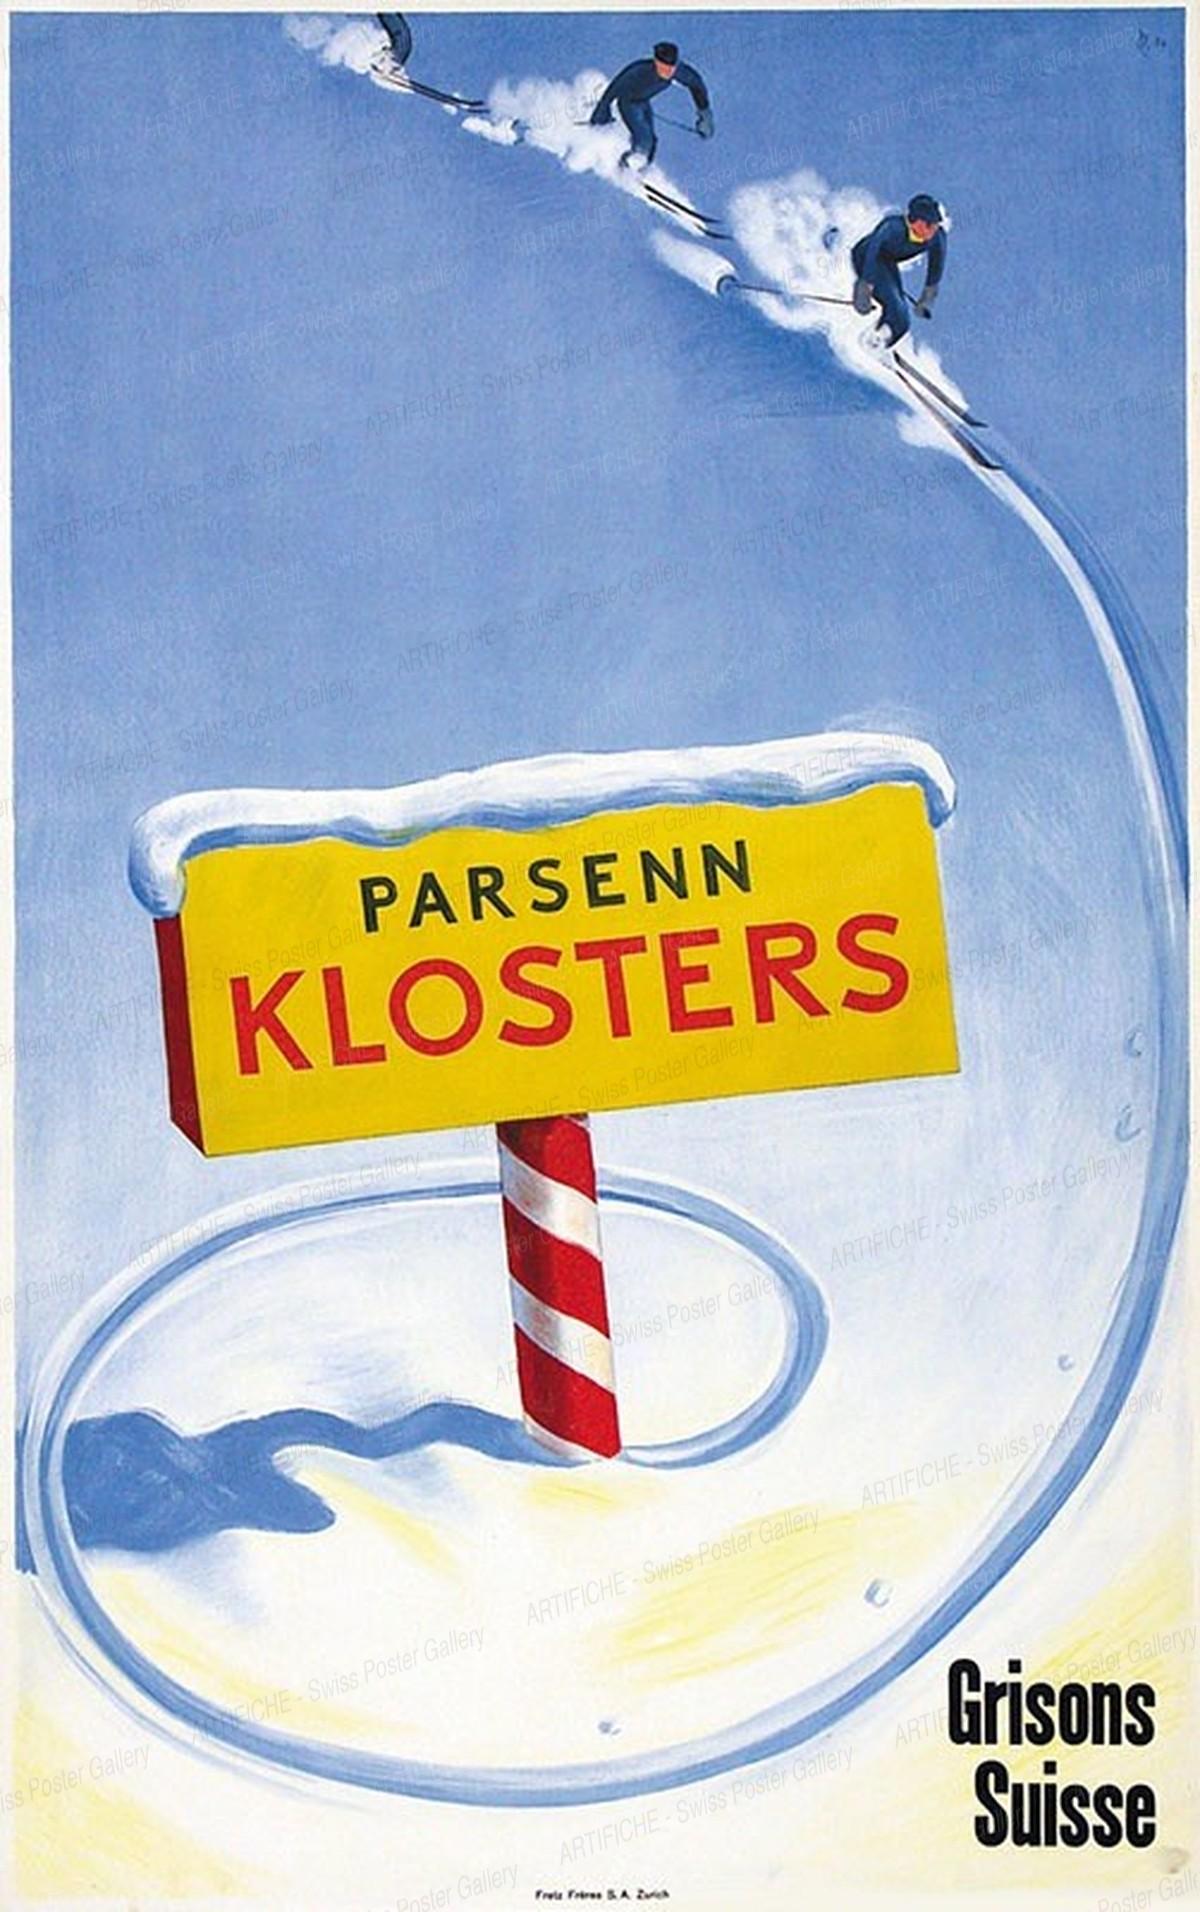 KLOSTERS Parsenn Grisons Suisse, Hugo Laubi